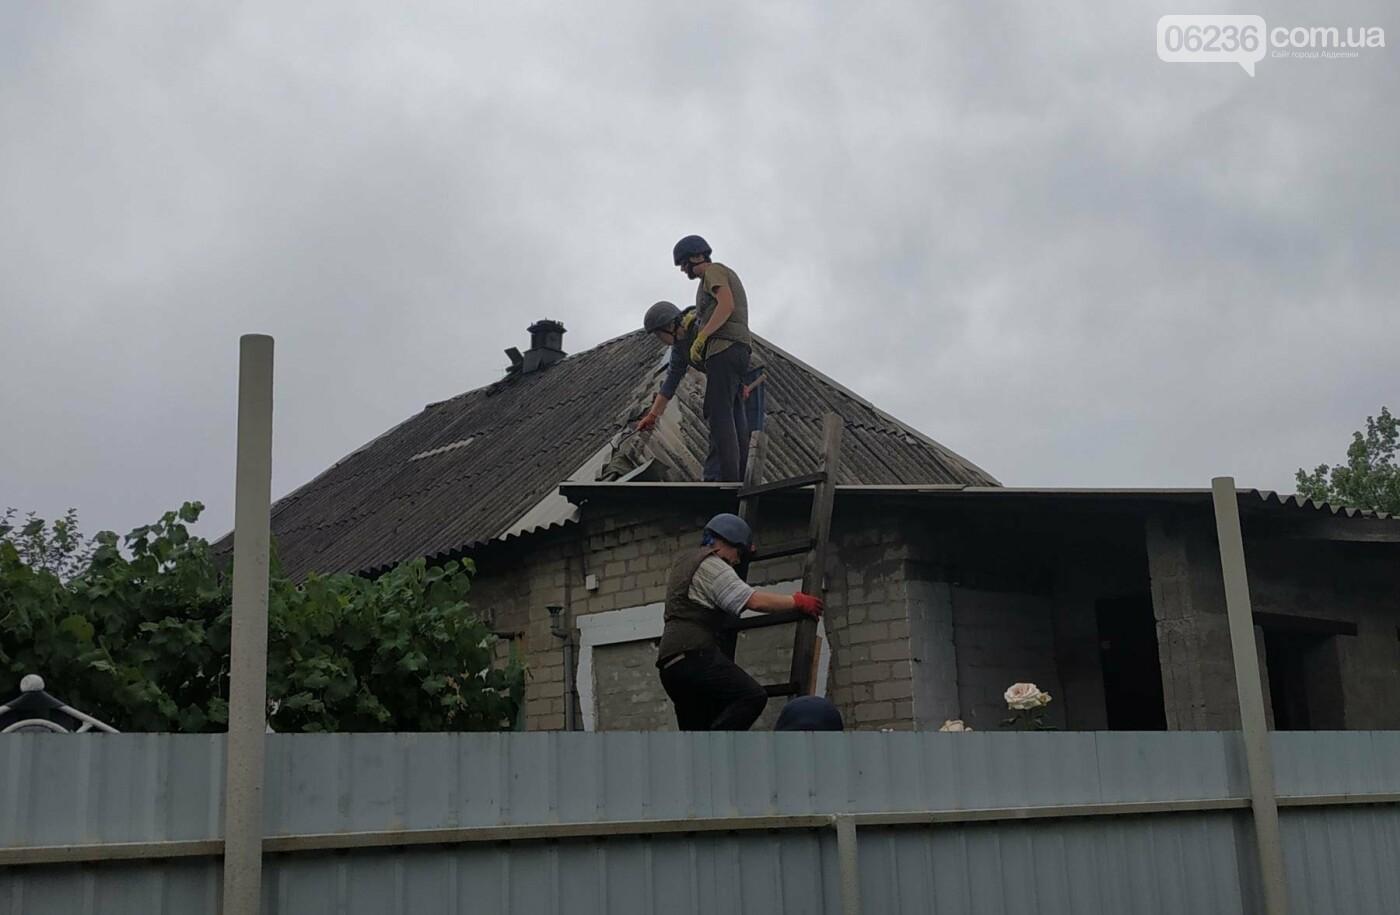 Спасатели ГСЧС продолжают восстанавливать Авдеевку (ФОТО), фото-2